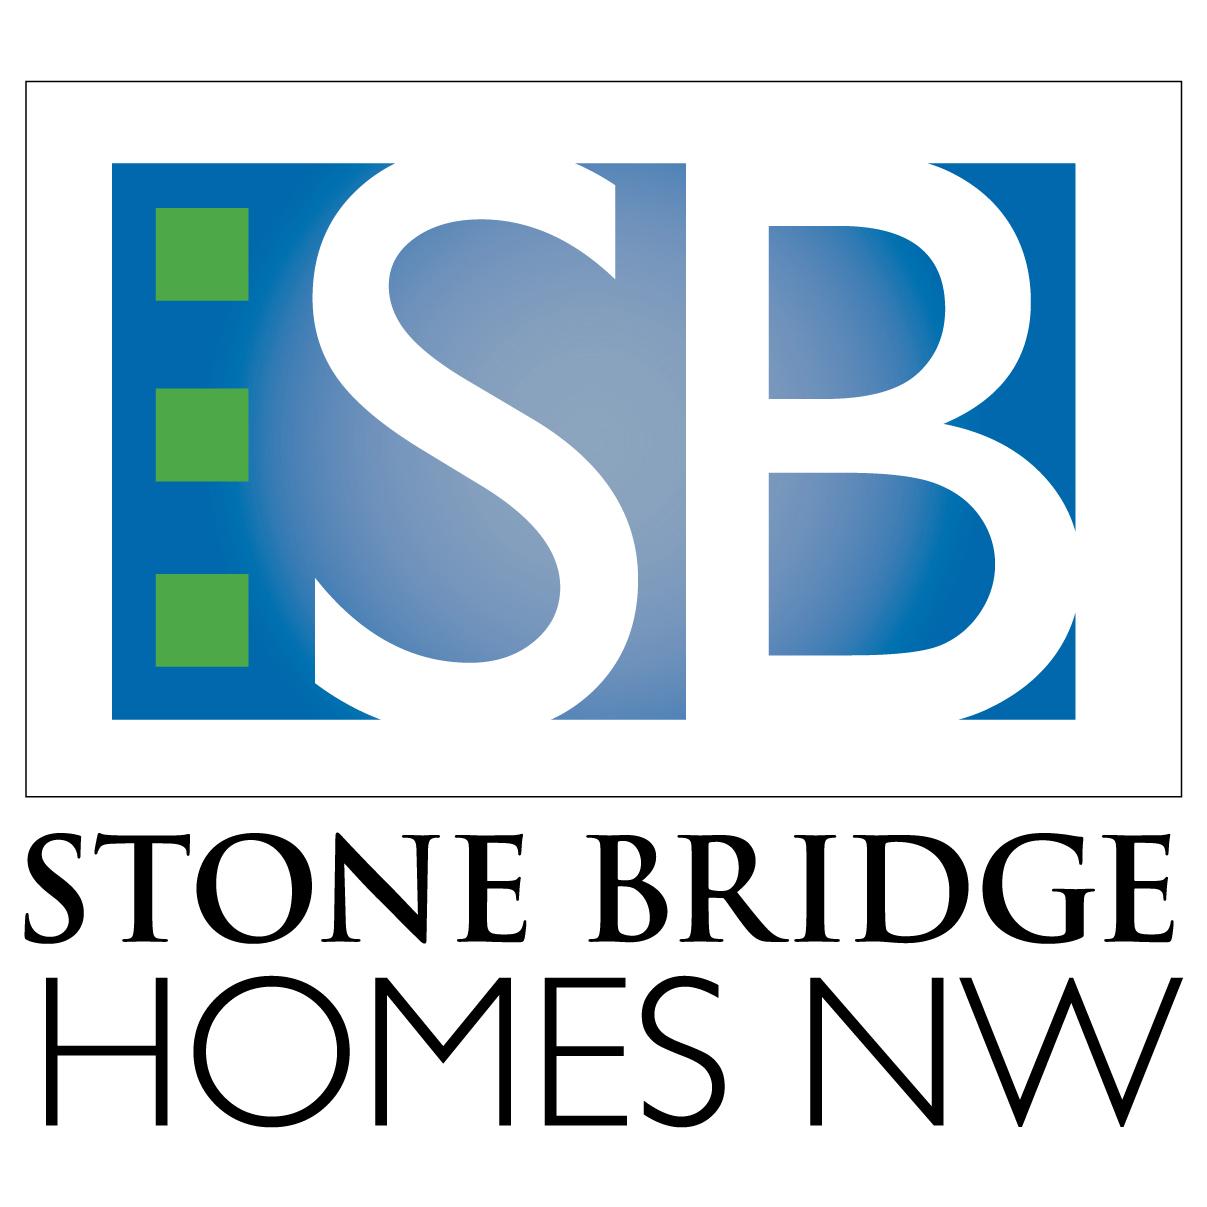 stone bridge homes nw.jpg